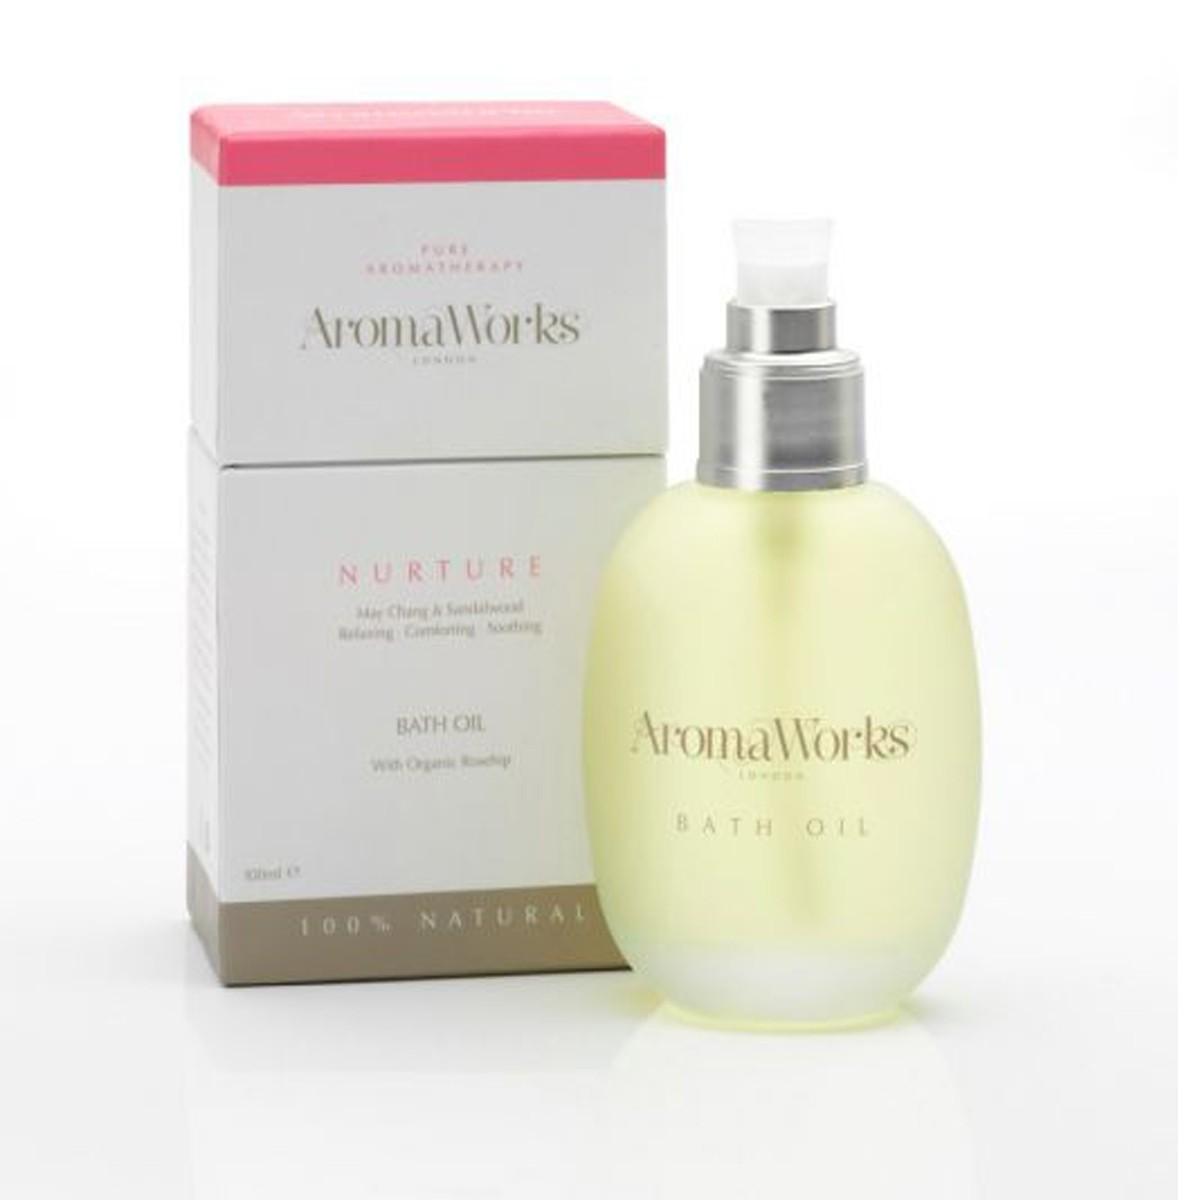 AromaWorks Nurture Body Oil